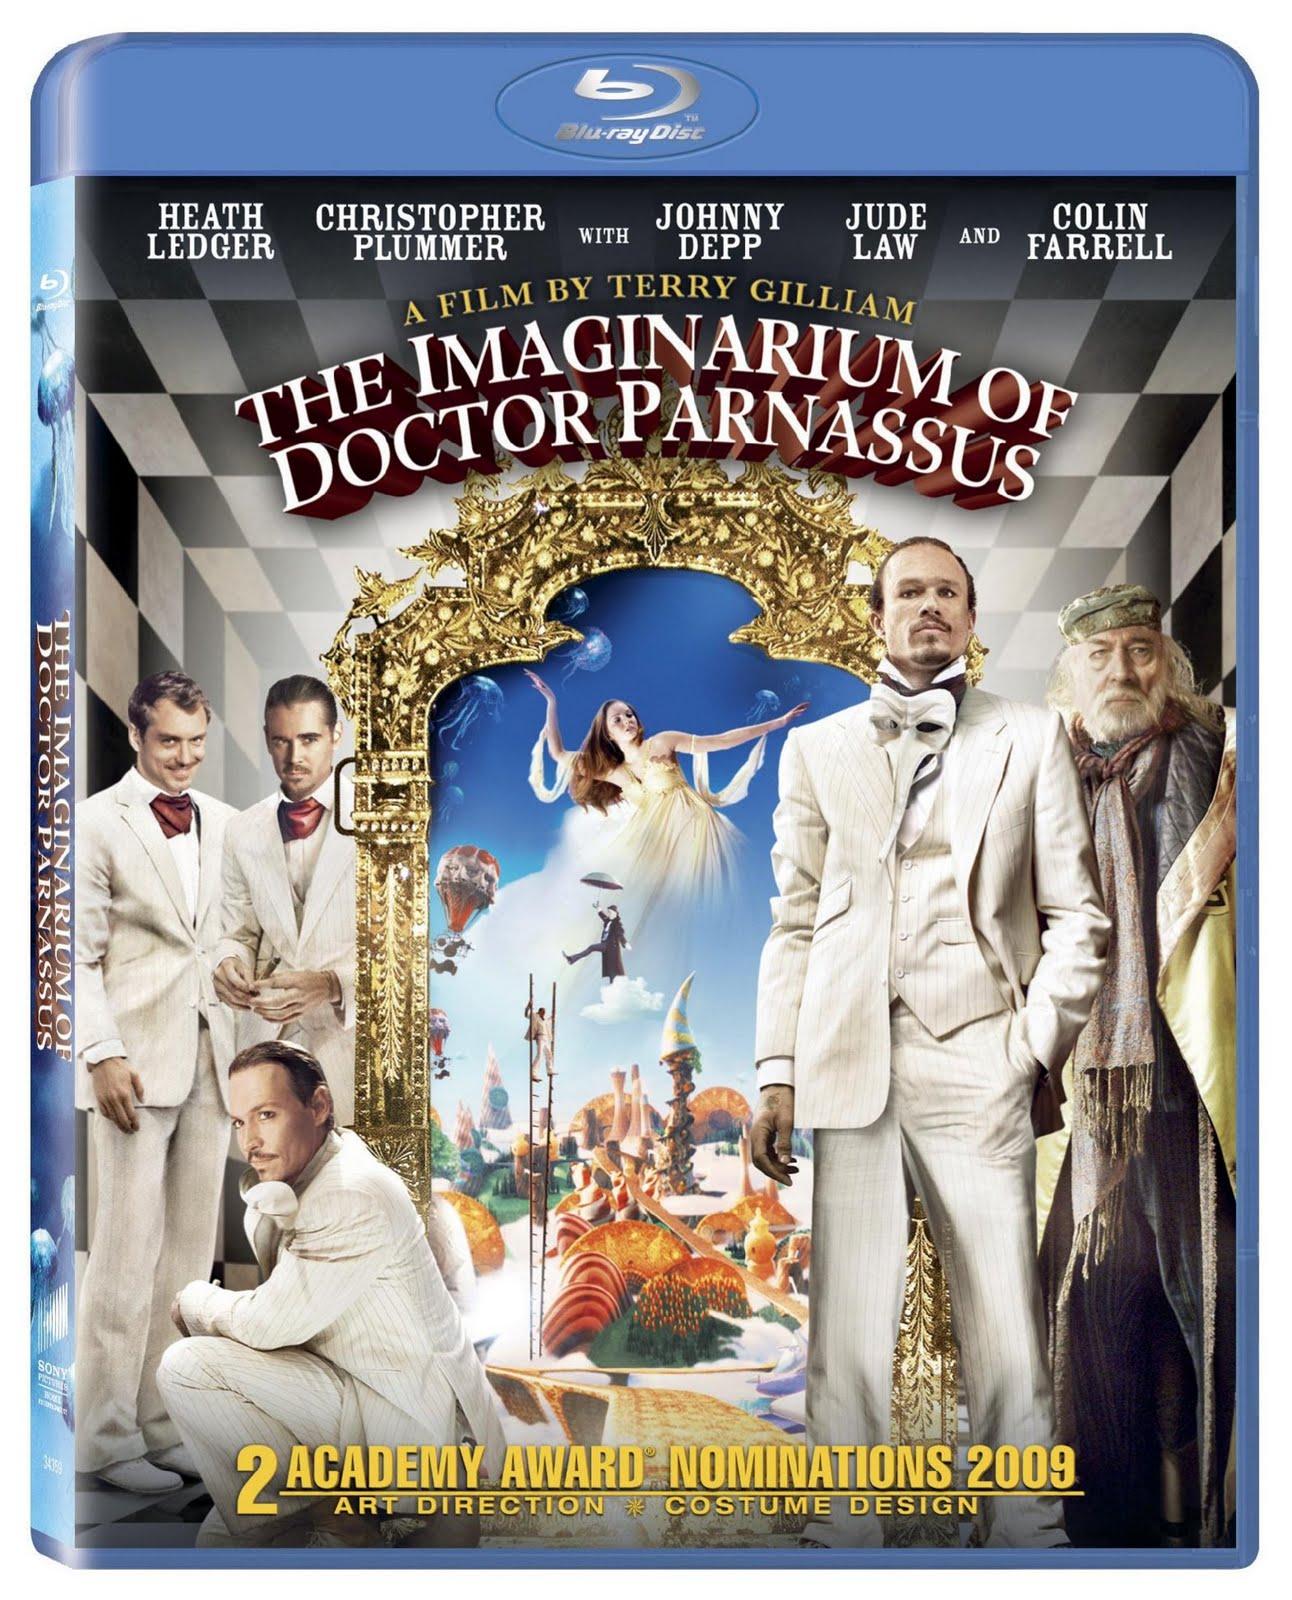 http://4.bp.blogspot.com/_ICrkijC_A9A/TKi_2GYlh8I/AAAAAAAAAfQ/xewsvGbxhiY/s1600/The-Imaginarium-of-Doctor-Parnassus.jpg